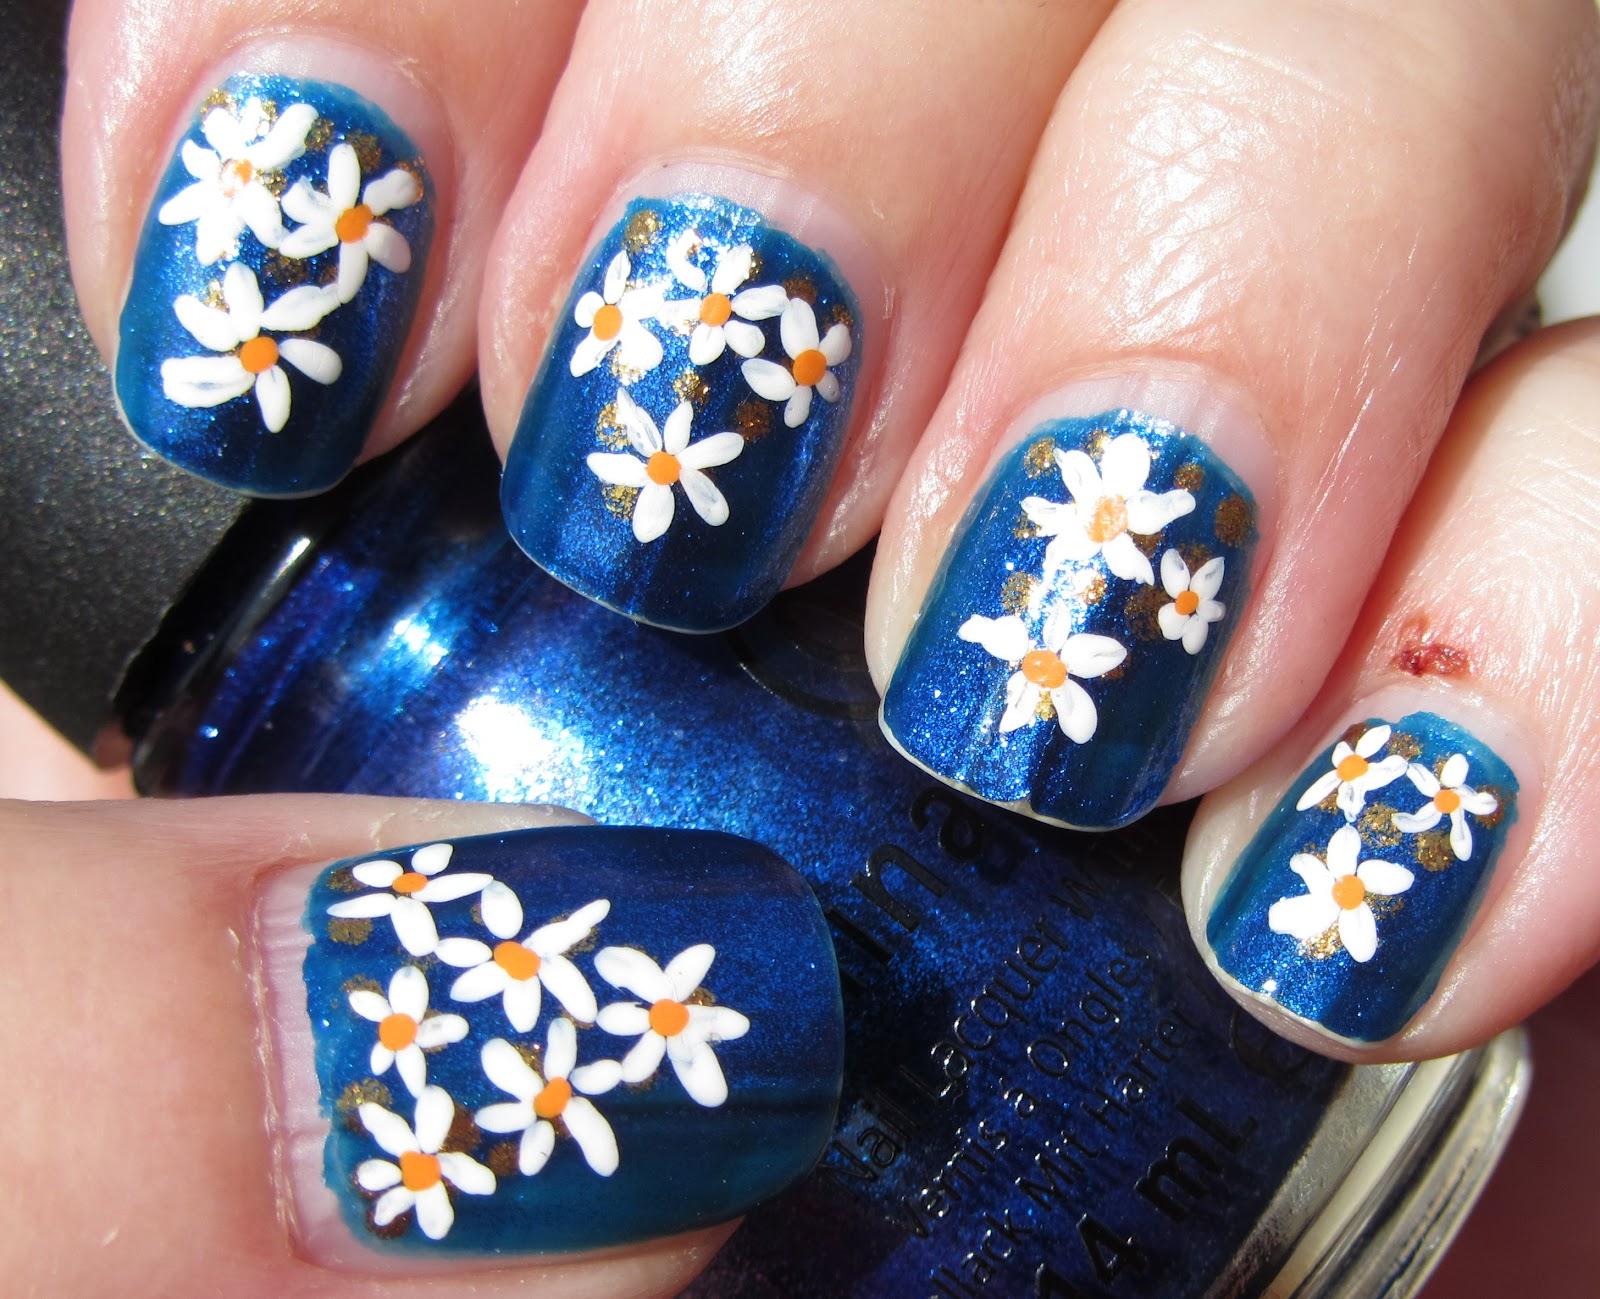 http://2.bp.blogspot.com/-6MBRJ1ERX3I/T6eH0m2c6ZI/AAAAAAAACyc/Kbxn8DQp2Kk/s1600/lasting_manicure.01.JPG